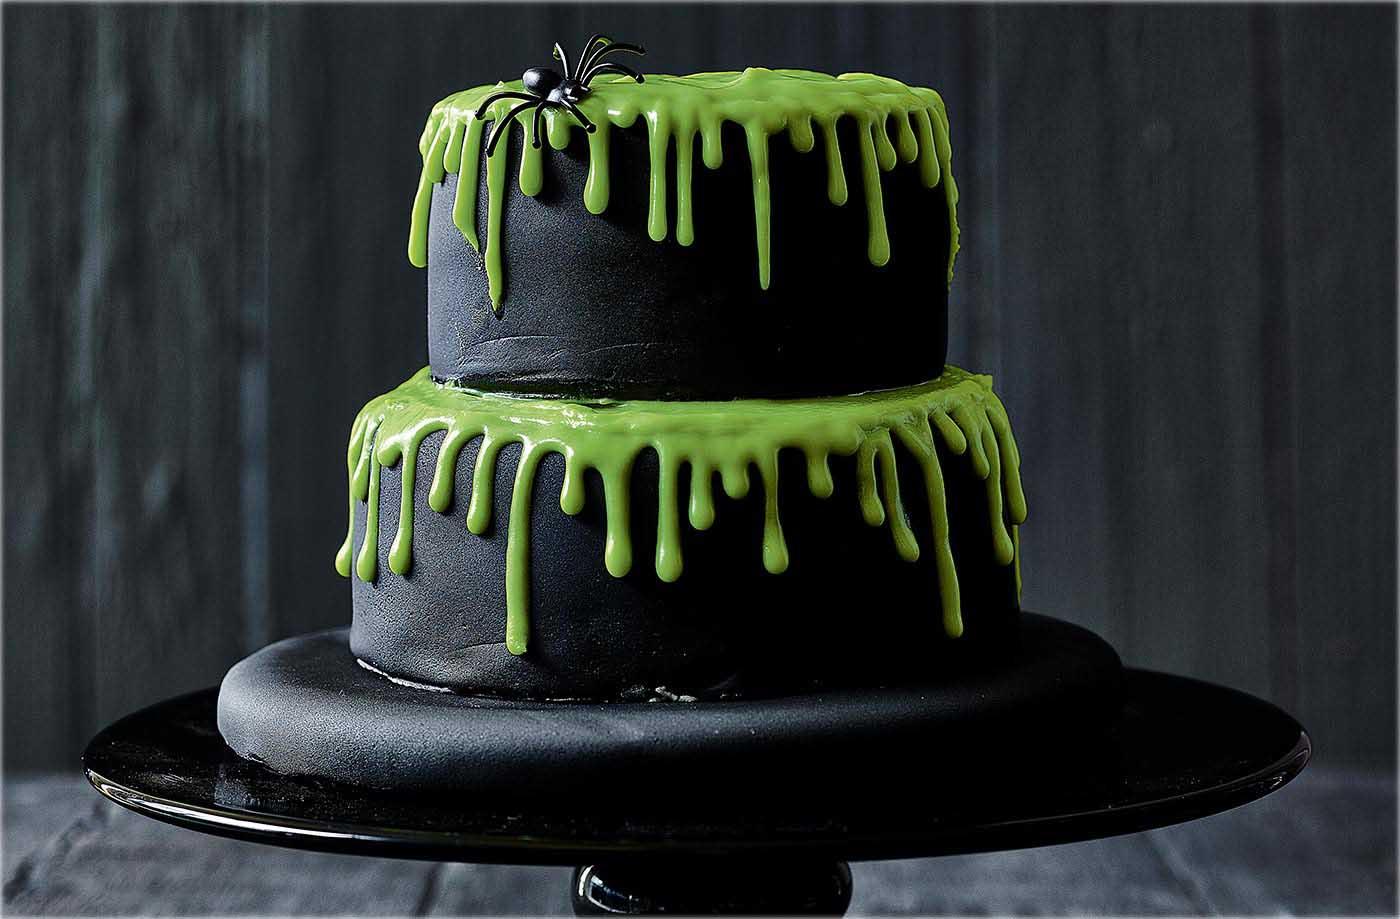 Dreadful dripping cake